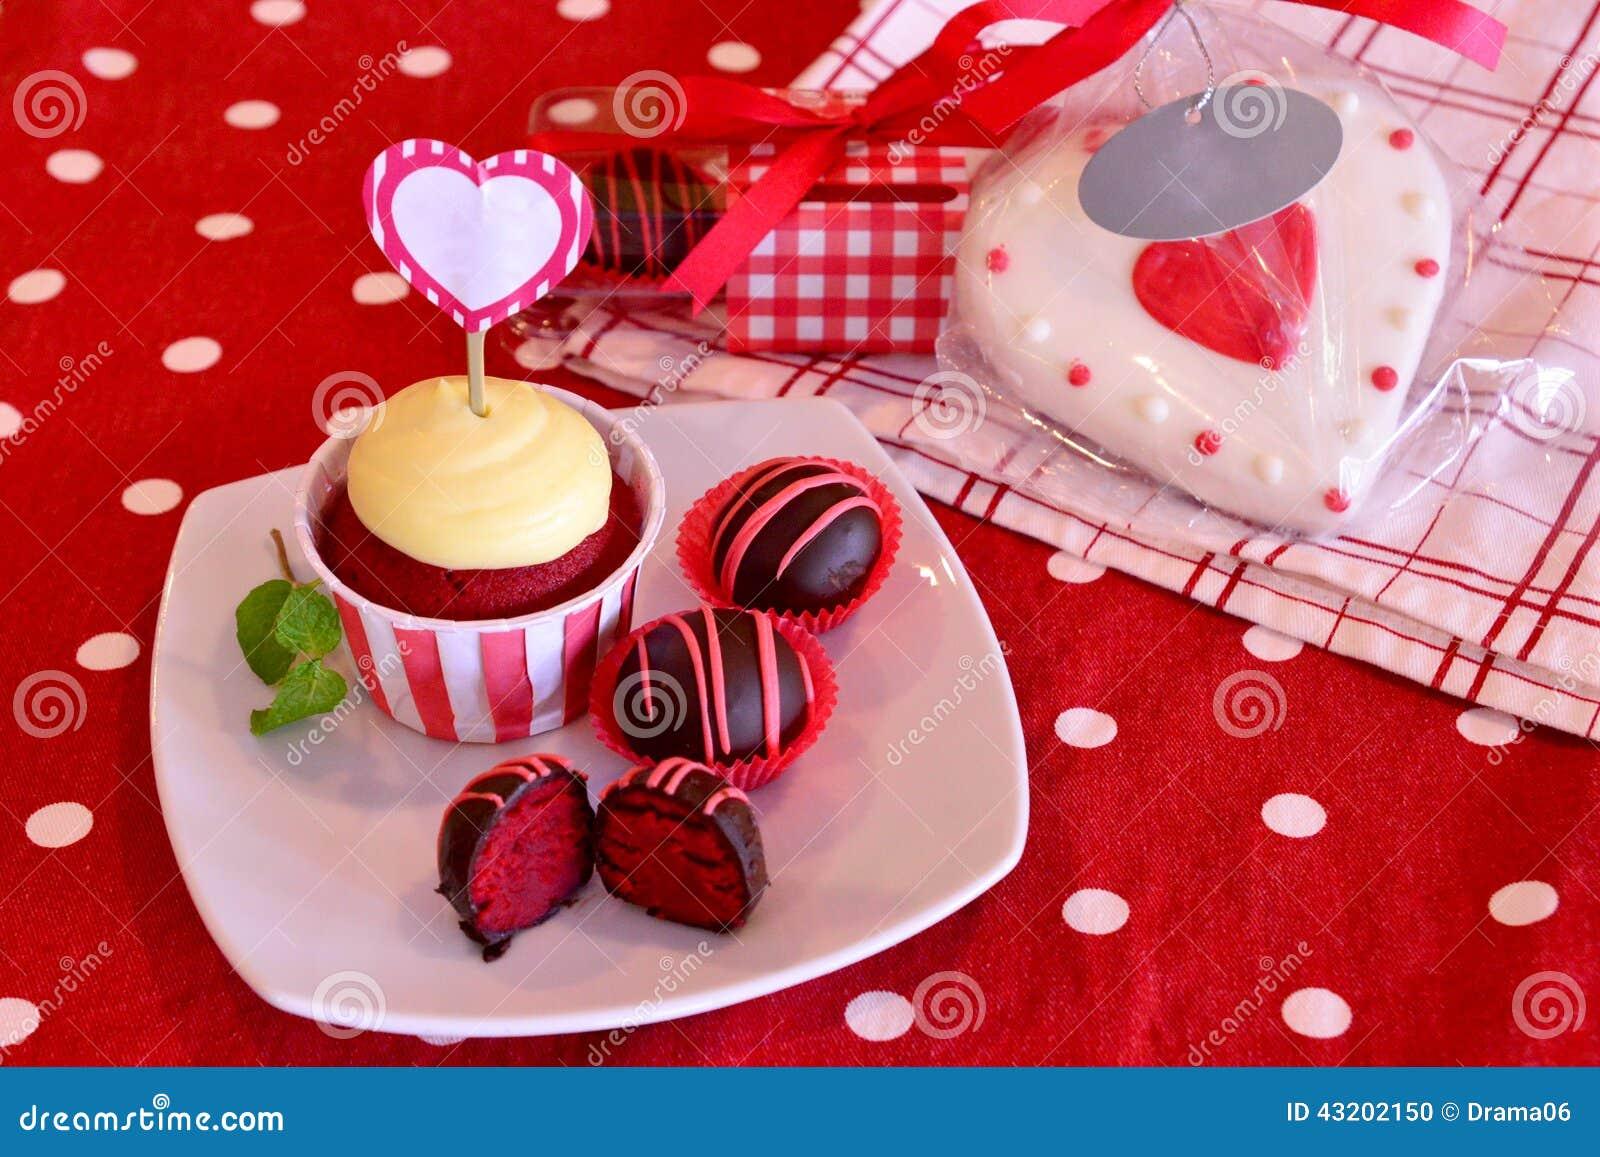 Download Röda sammettårtapop arkivfoto. Bild av bagerit, bakelse - 43202150